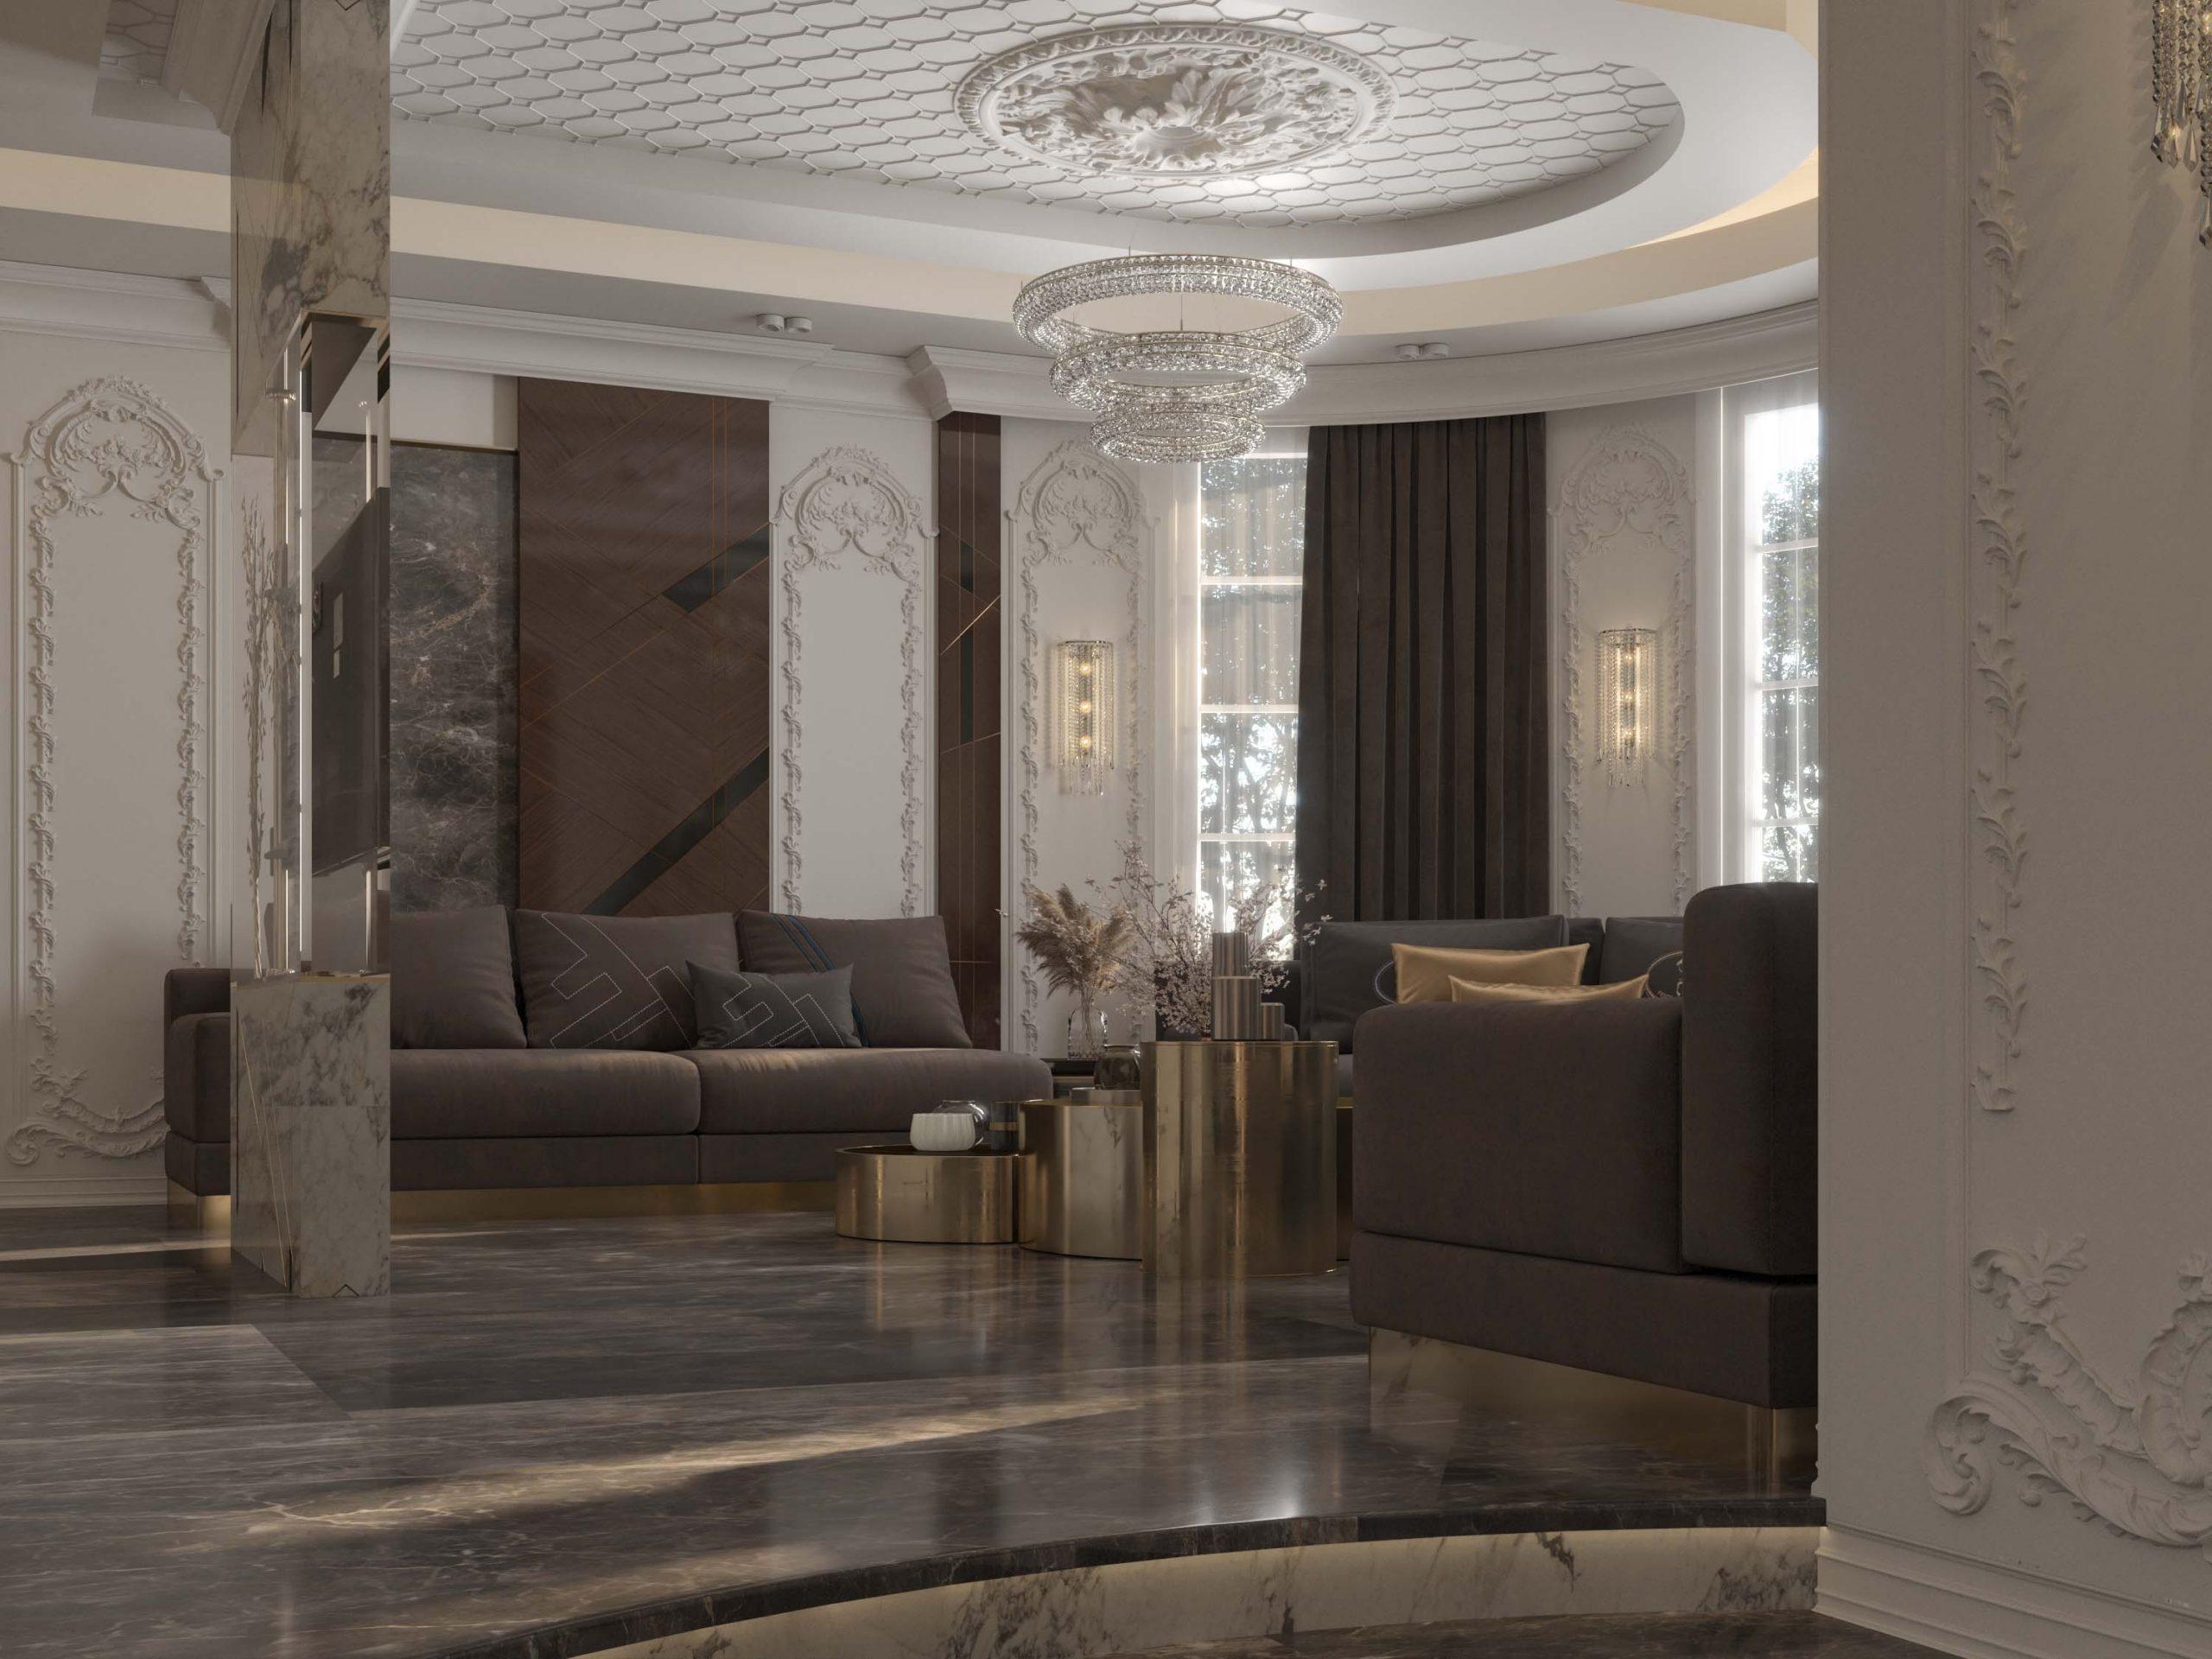 well design sala - main hall - sitting room